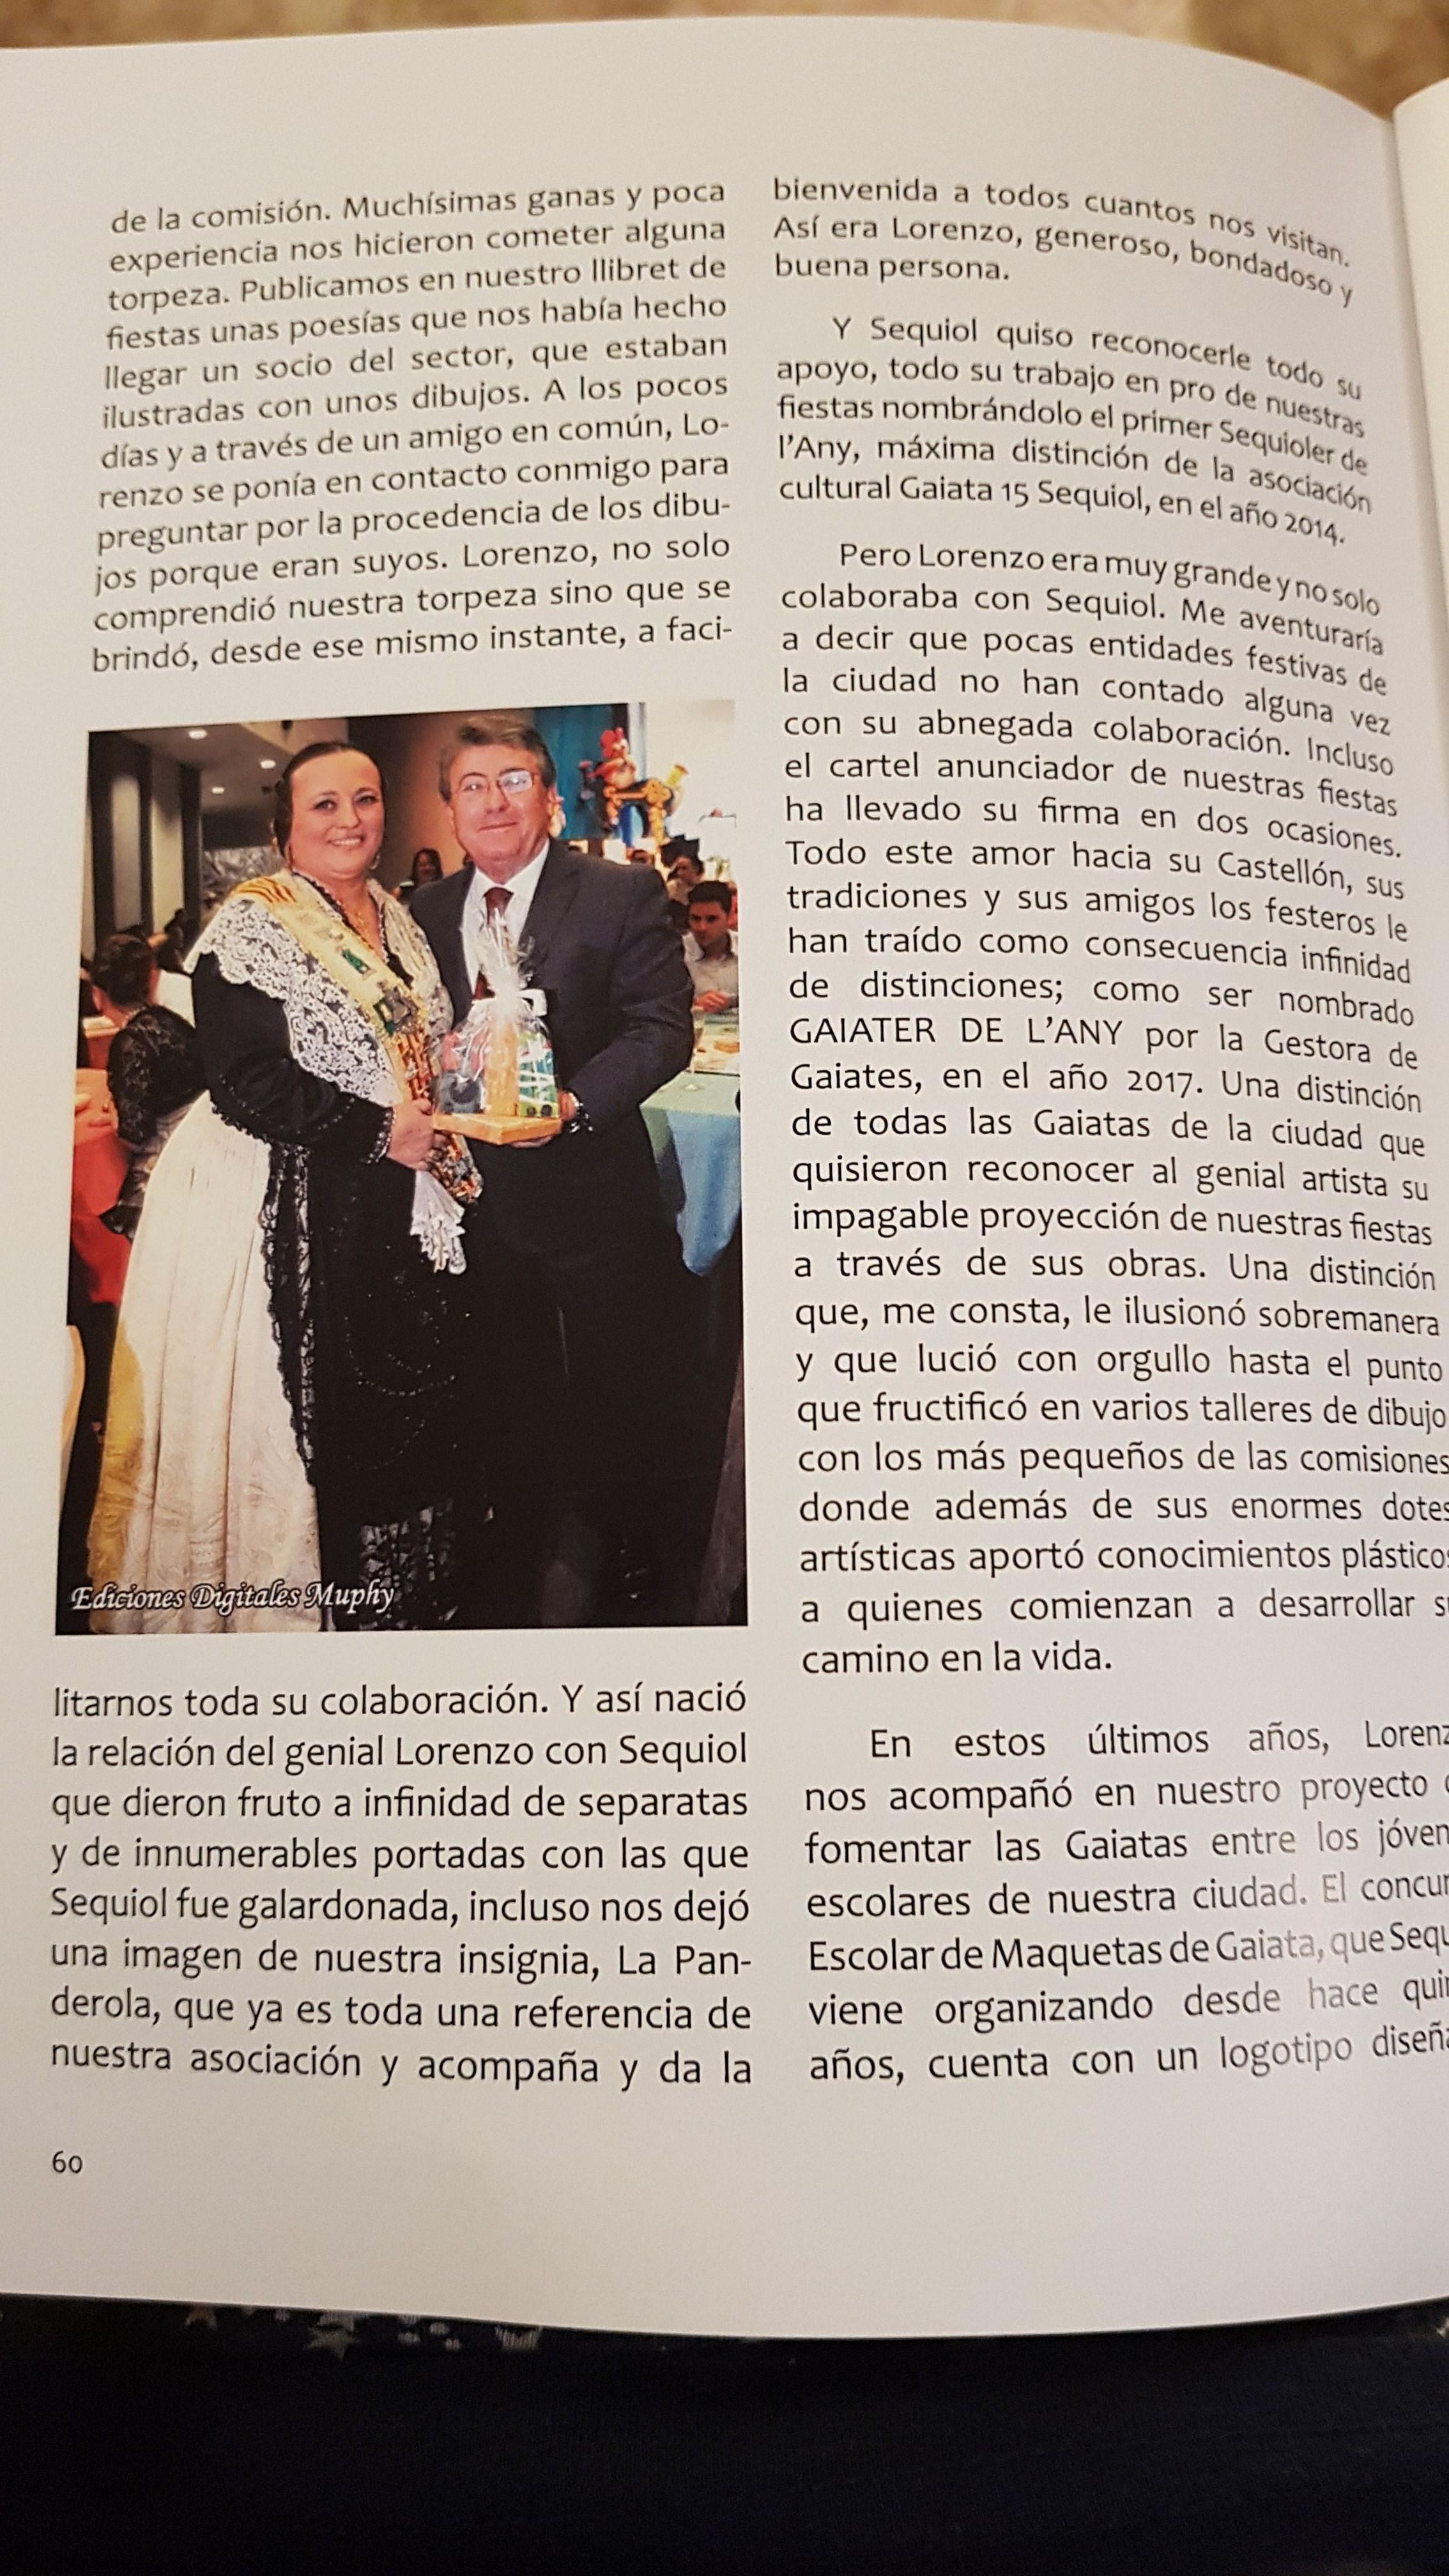 HOMENAJE LORENZO RAMIREZ-20180609-WA0019